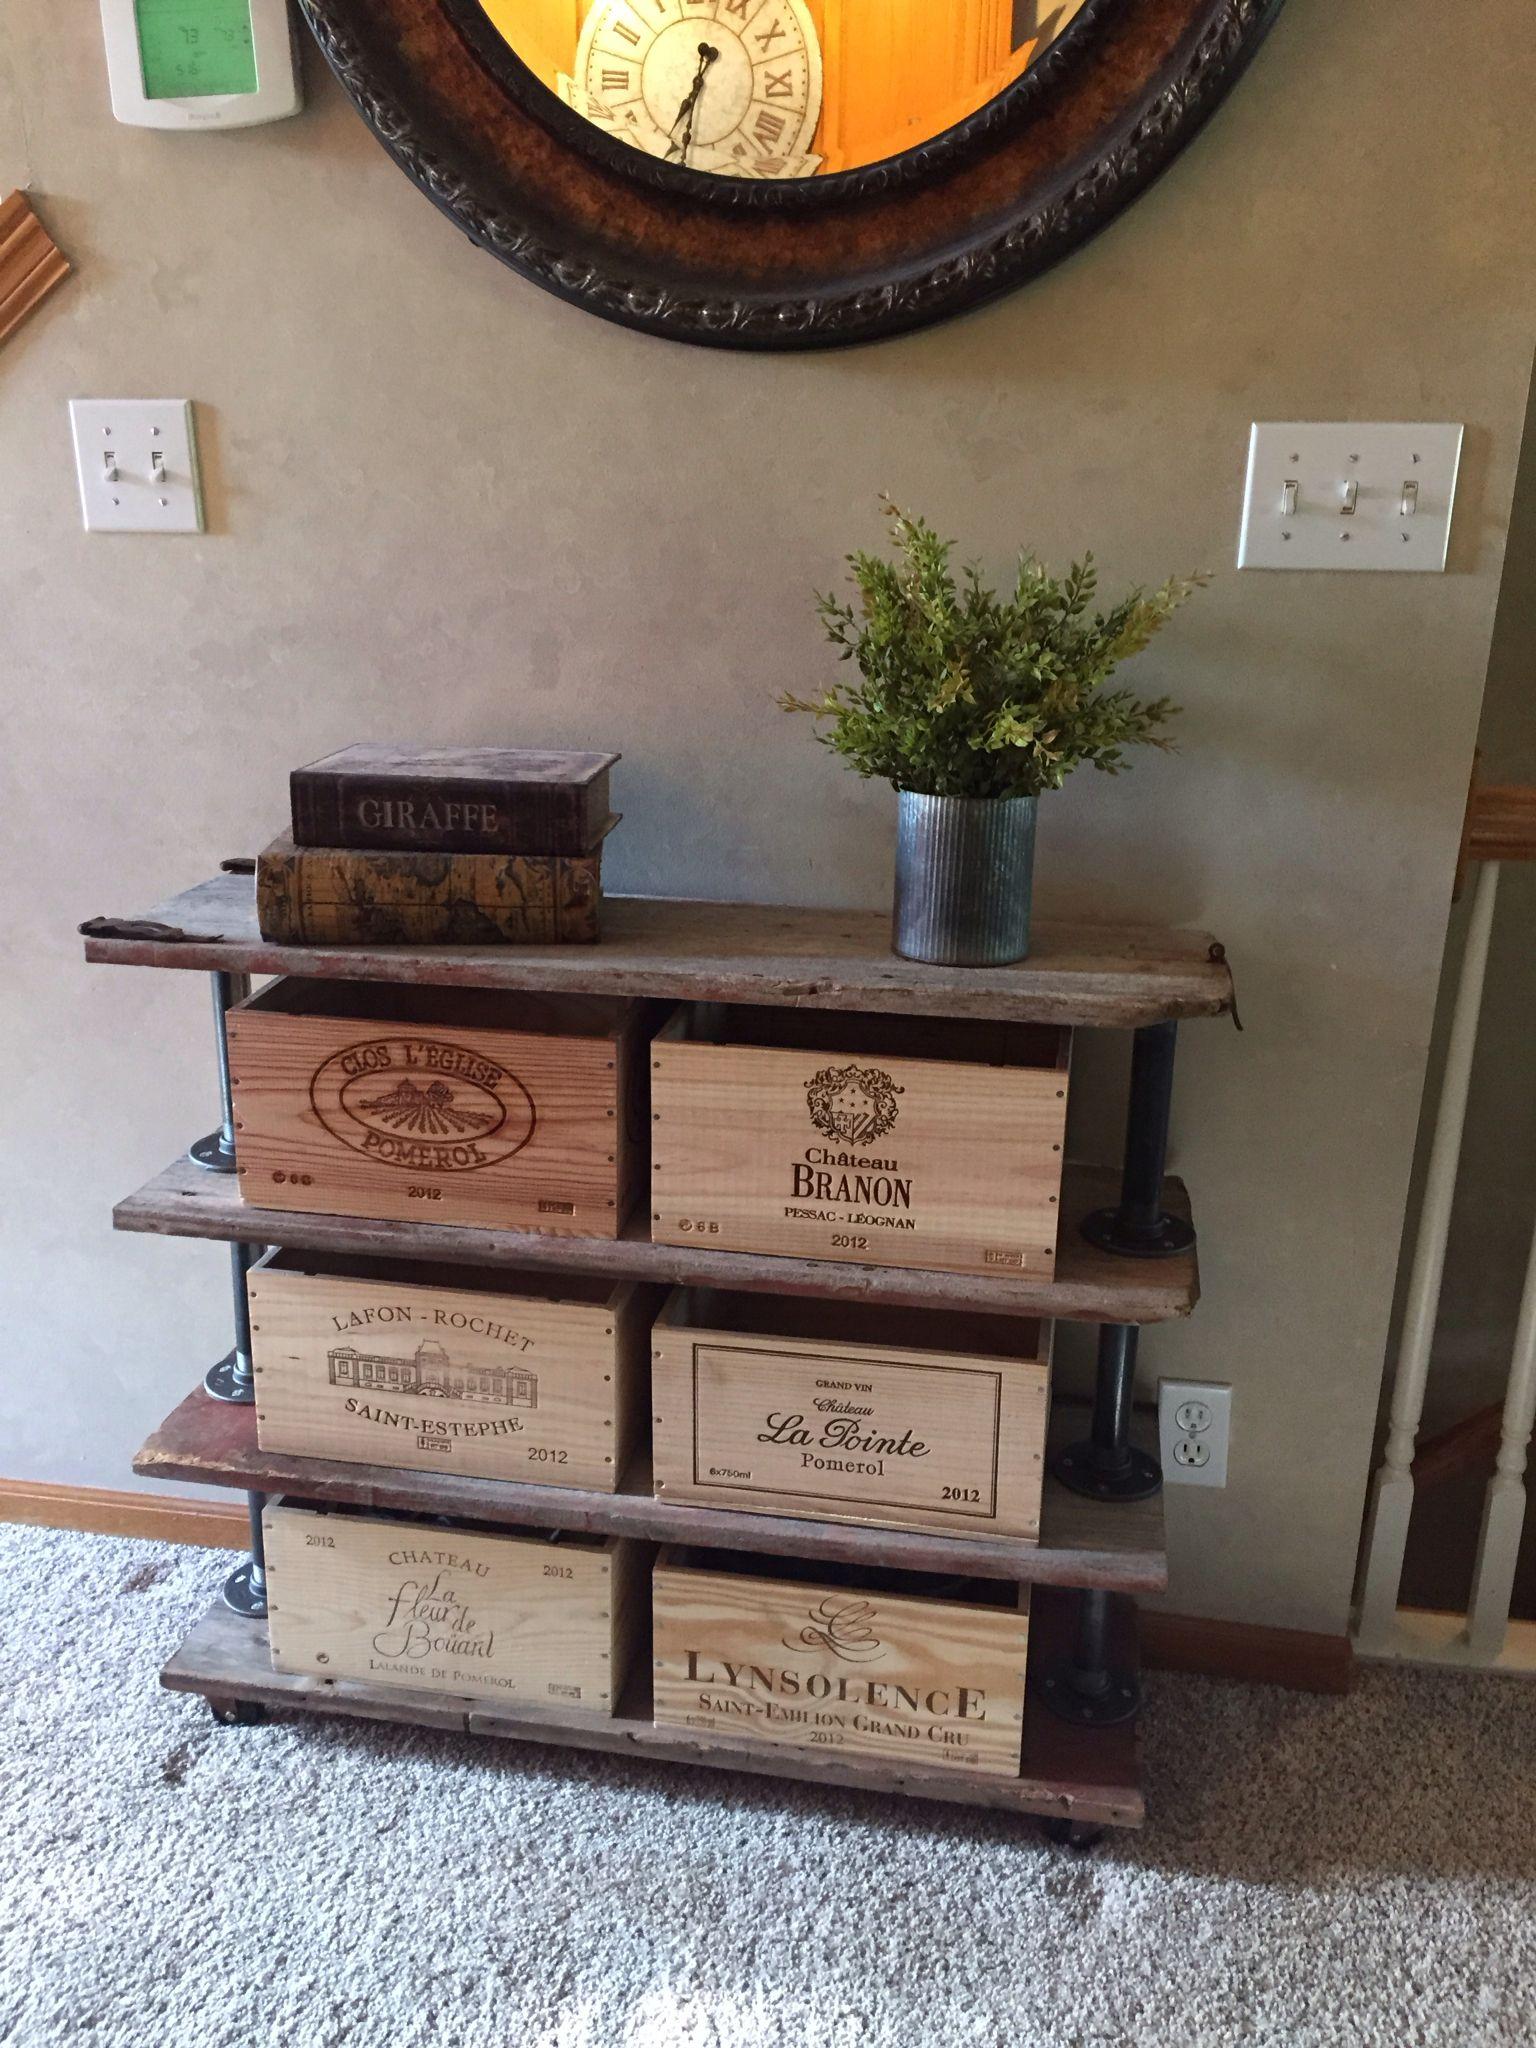 Wine crate storage custom made with reclaimed barn doors. Farber.sean@yahoo.